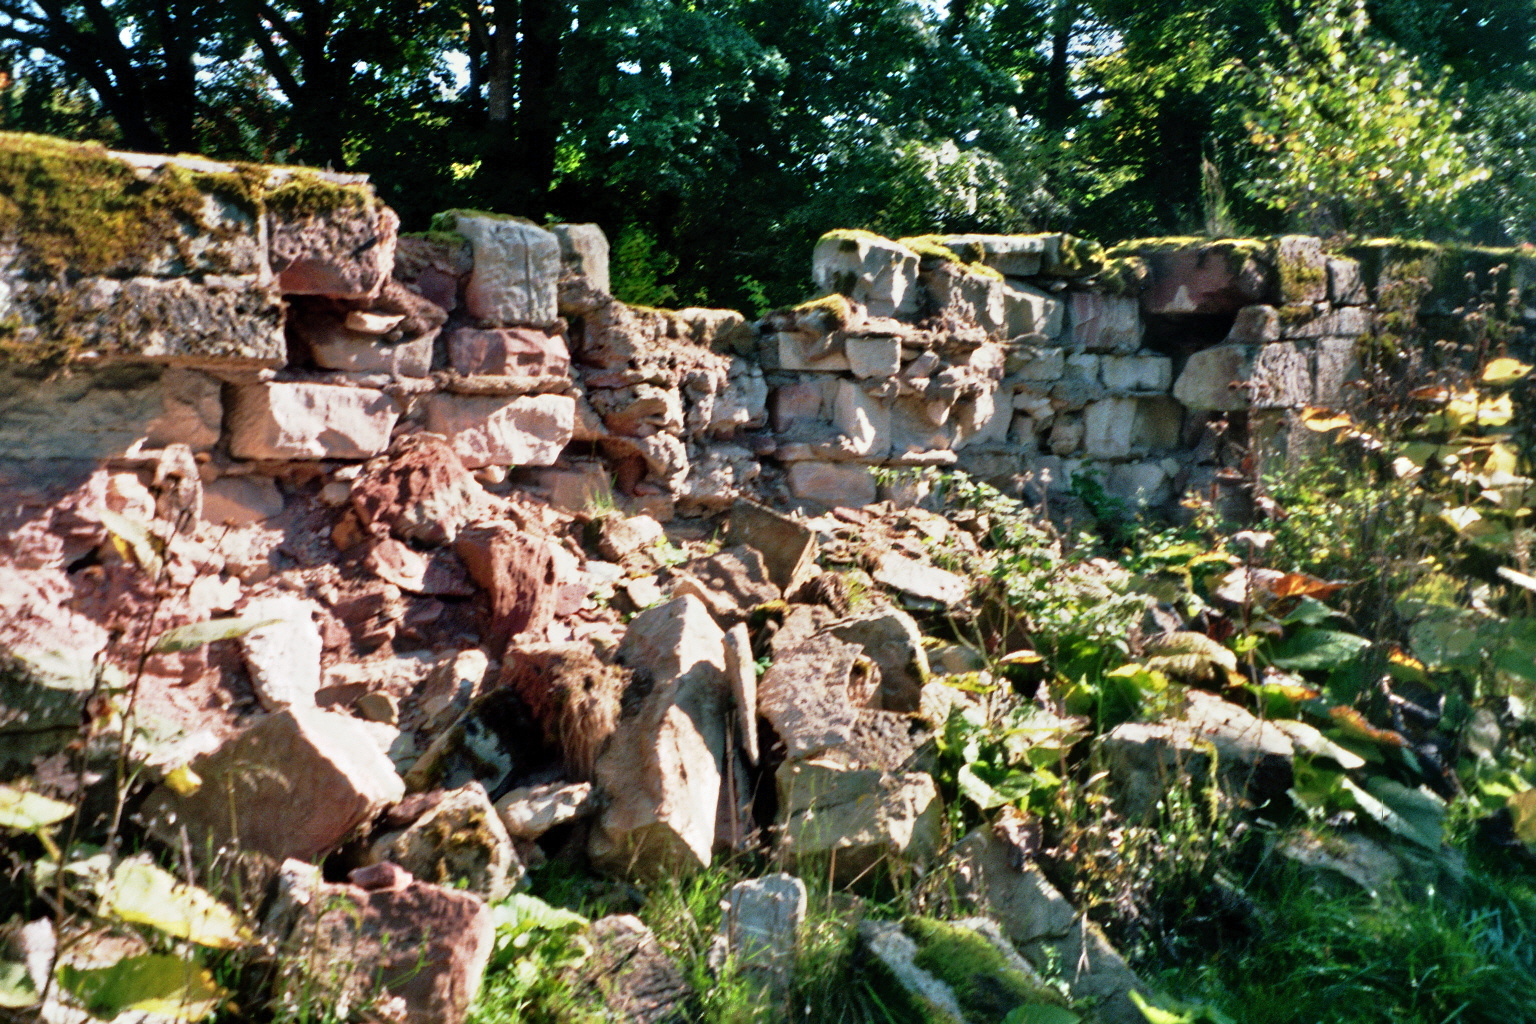 Schloß Reinhardsbrunn Thüringen Friedrichroda kapute Mauern